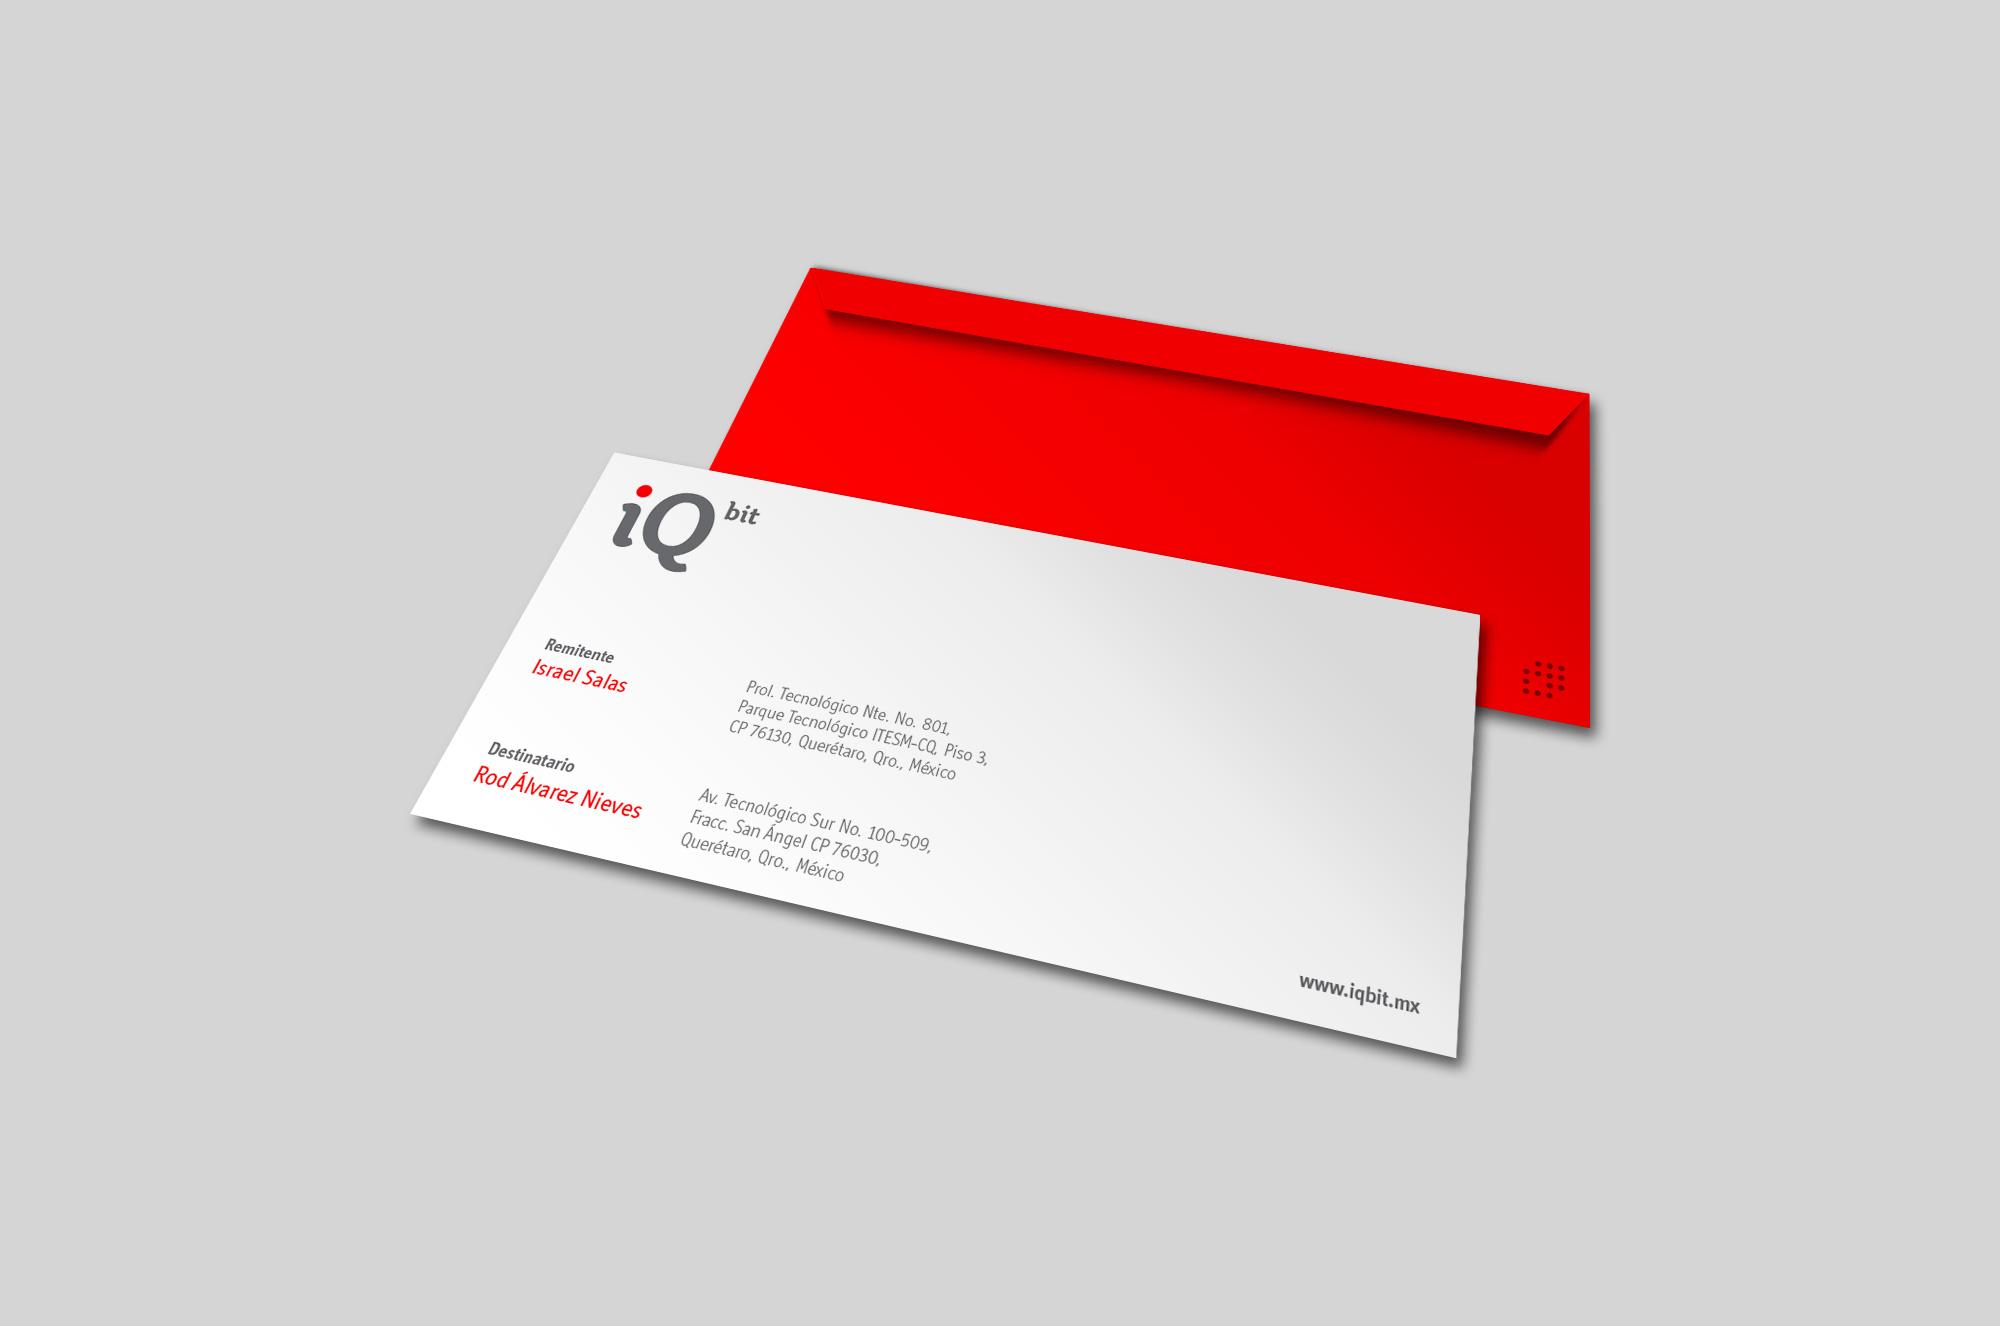 raniev-rod-alvarez-diseño-gráfico-queretaro-iqbit-4-envelope